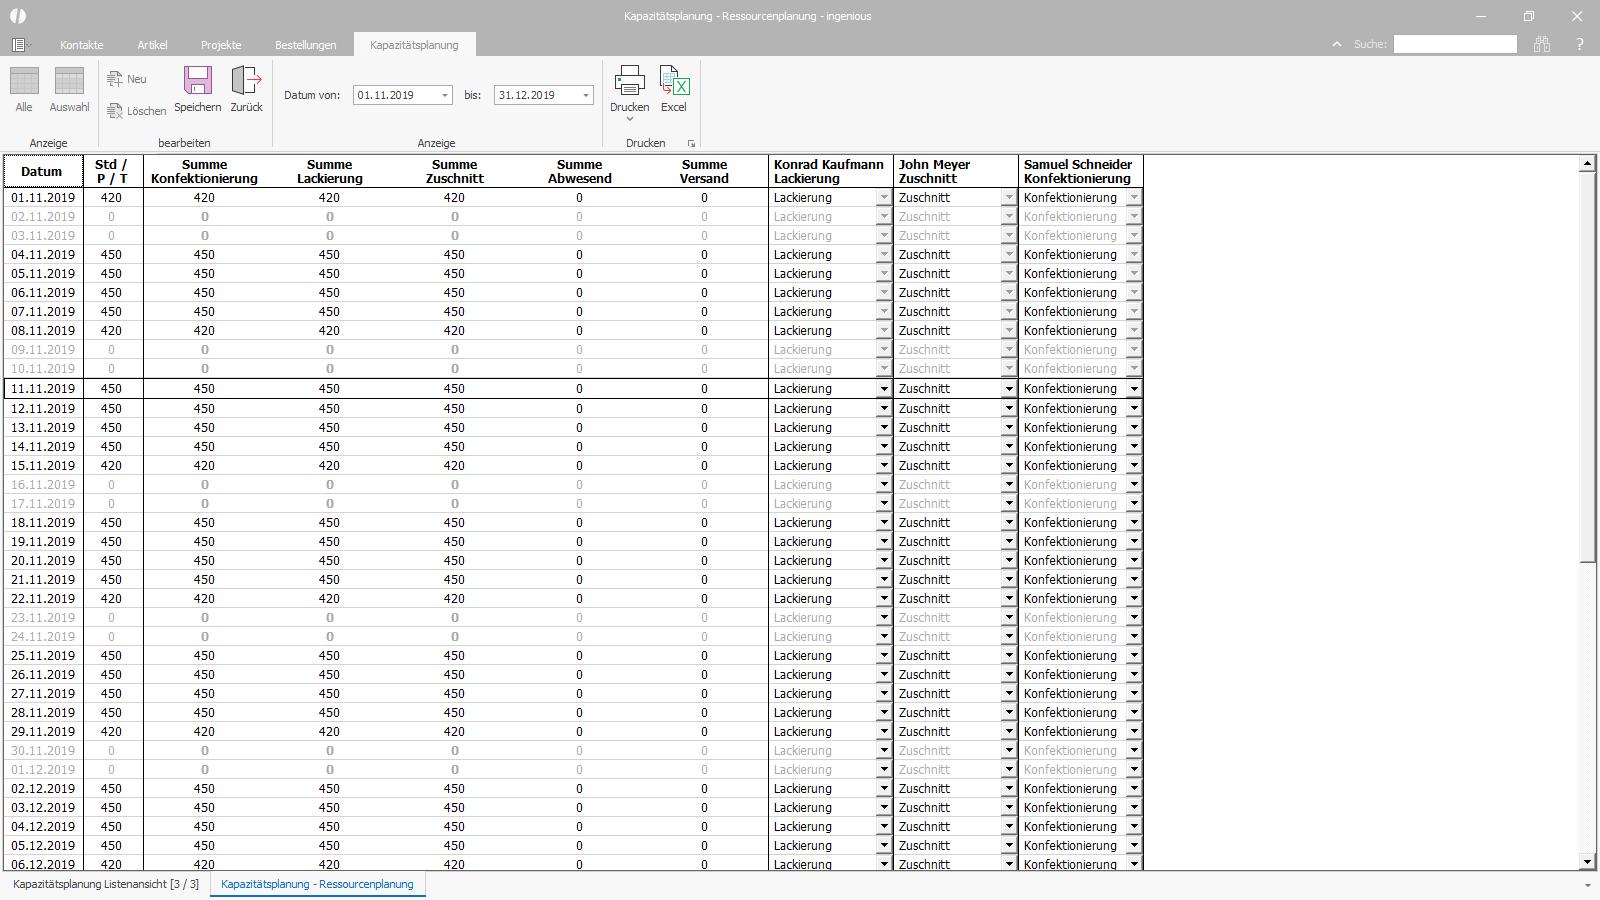 Ingenious Software Kapazitätsplanung Einsatzplanung